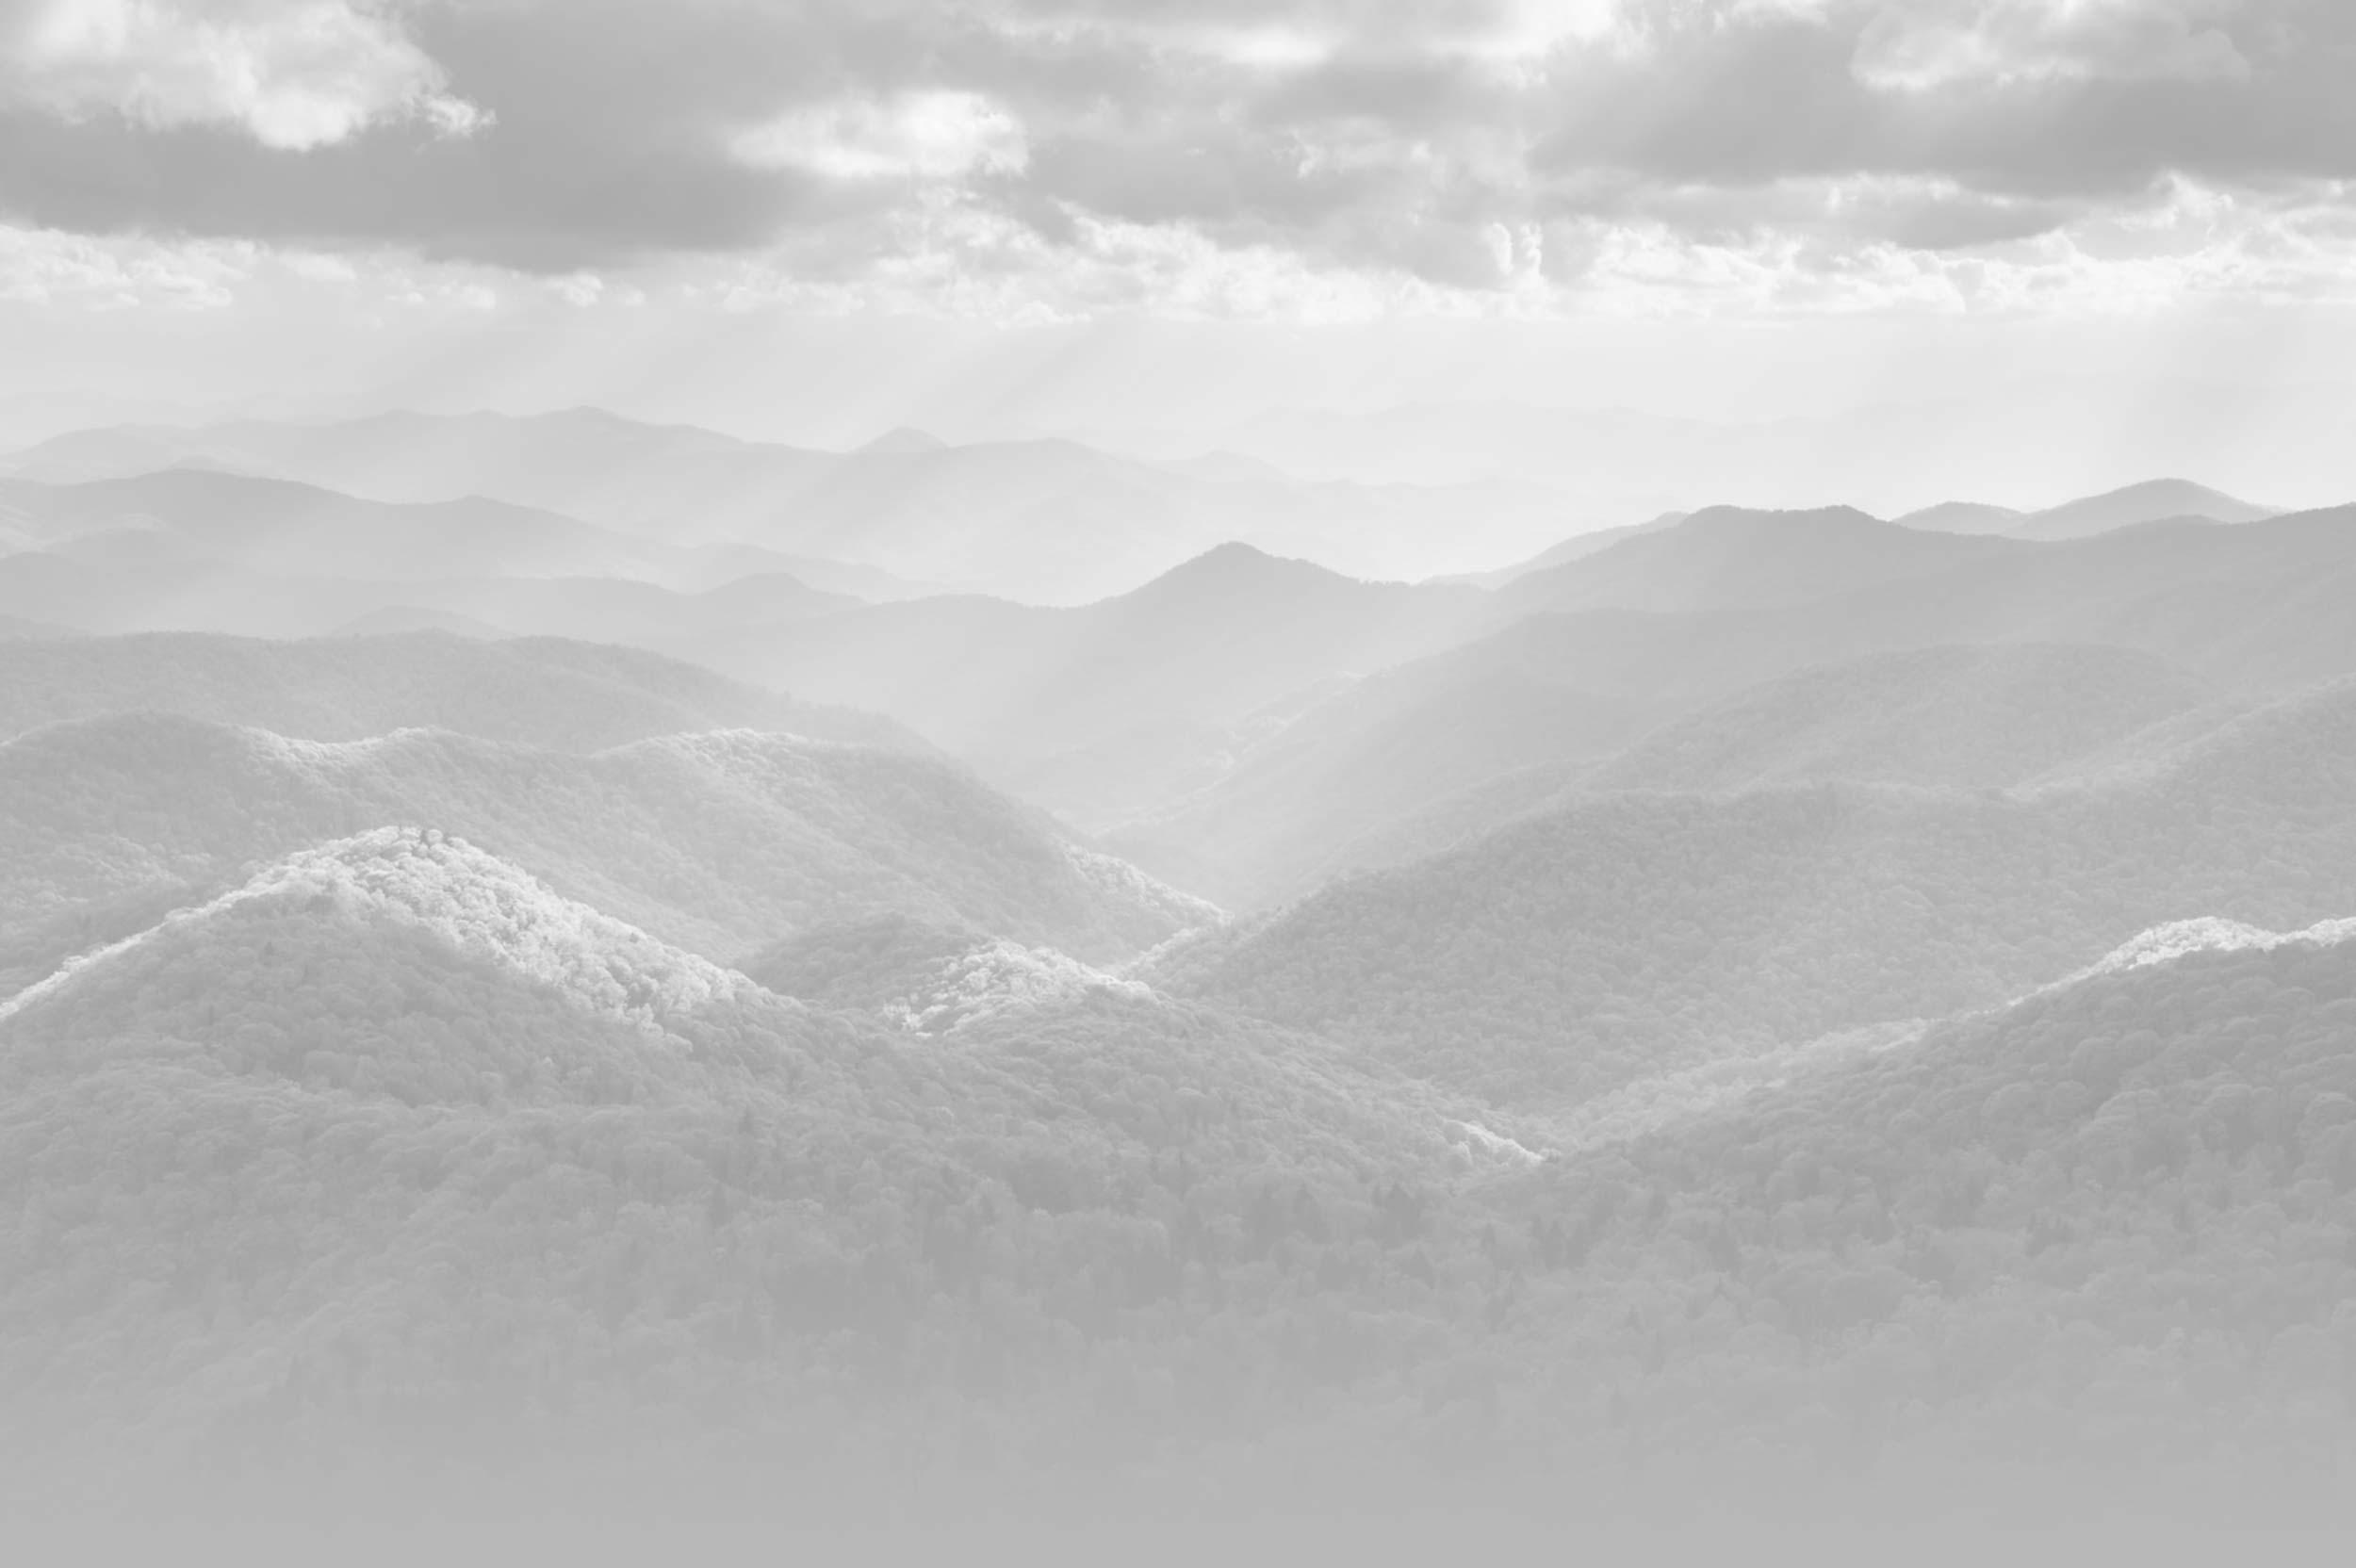 https://www.vantagep.com/wp-content/uploads/2014/08/mountains-gray-141540133.jpg